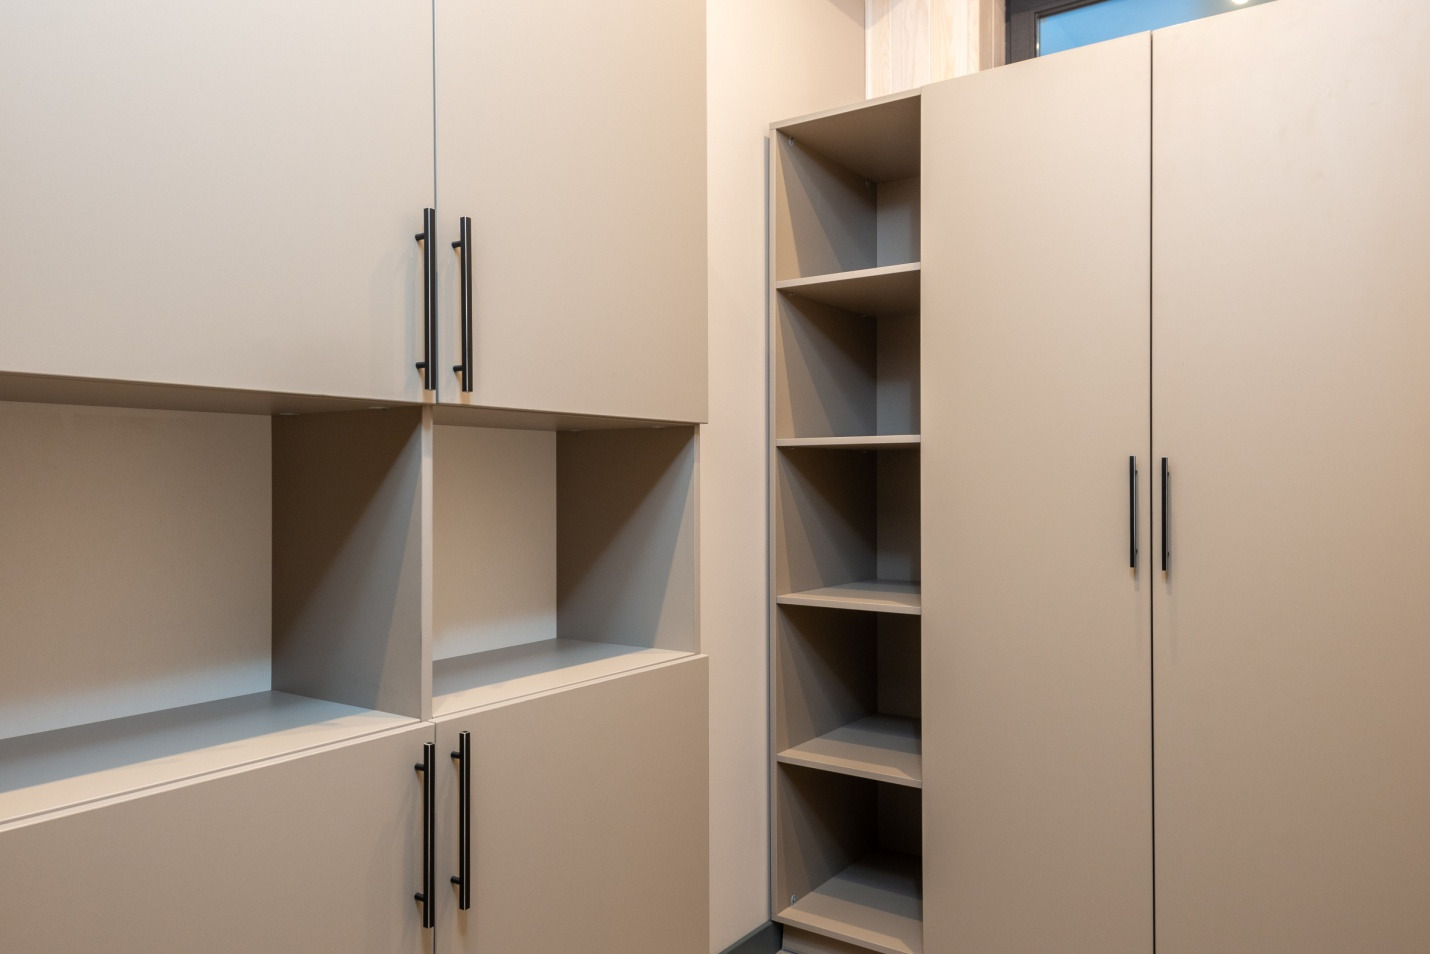 Locket cabinets for schools